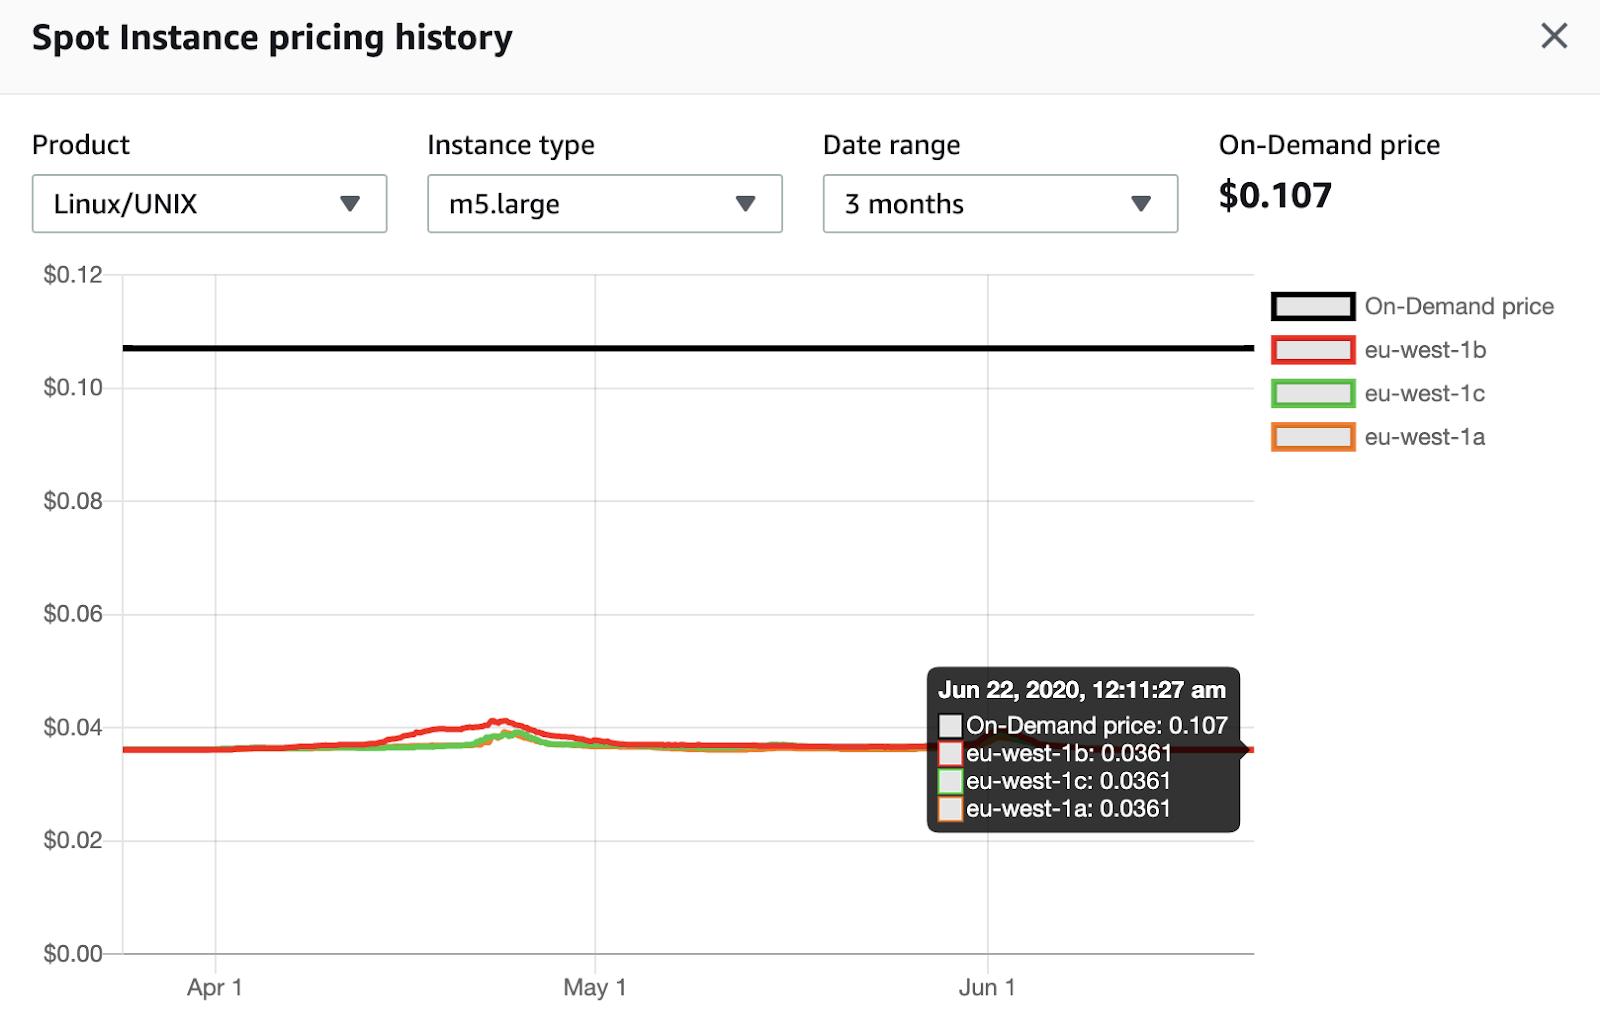 spot instance pricing history